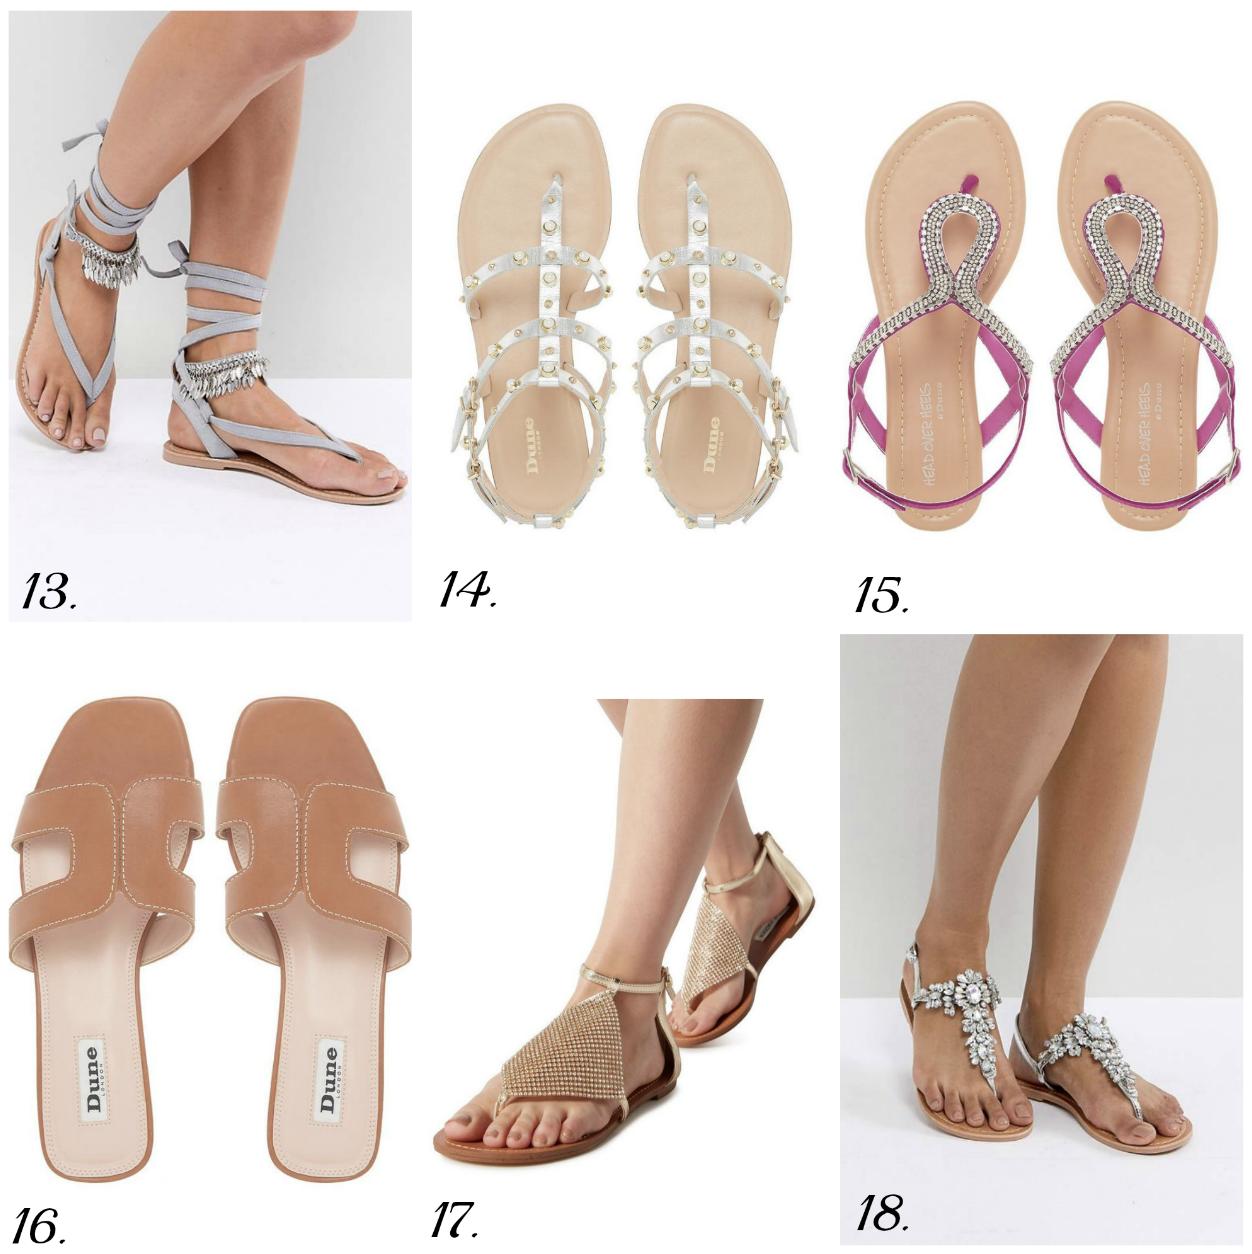 The best flat sandal styles for summer 2018